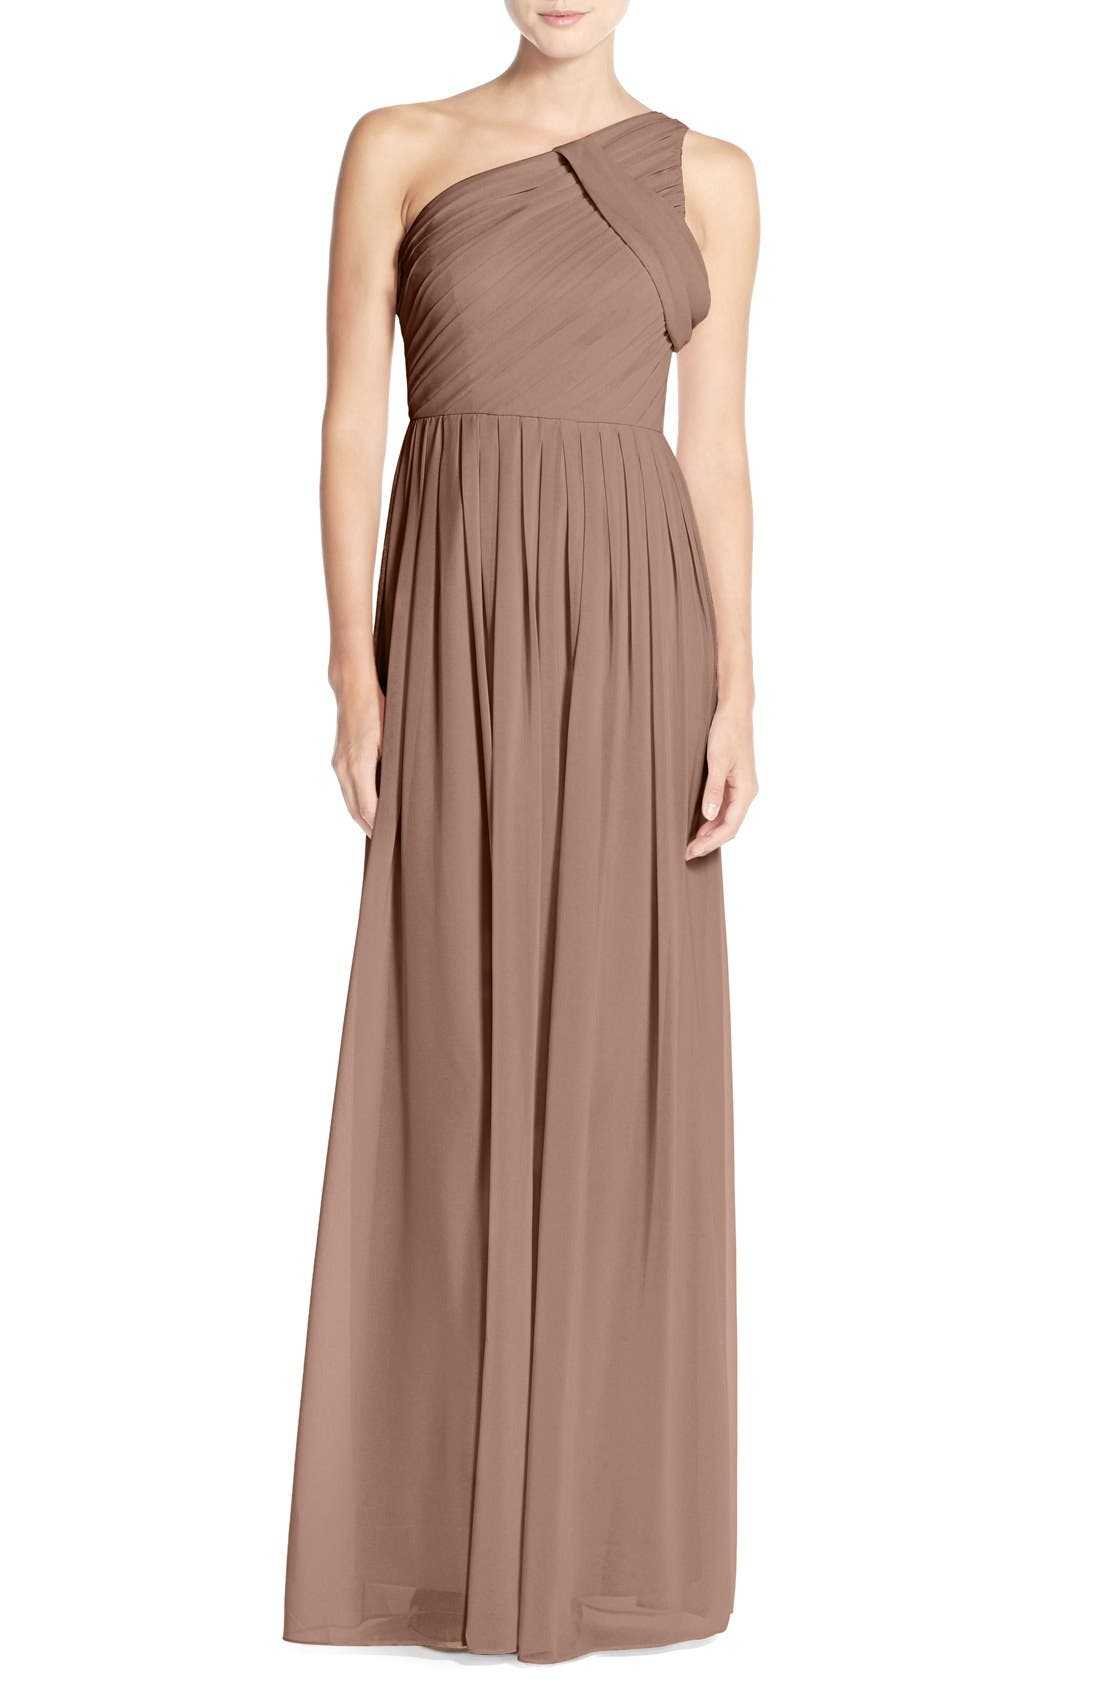 'Chloe' One-Shoulder Pleat Chiffon Gown,                             Main thumbnail 1, color,                             Hibiscus Tea